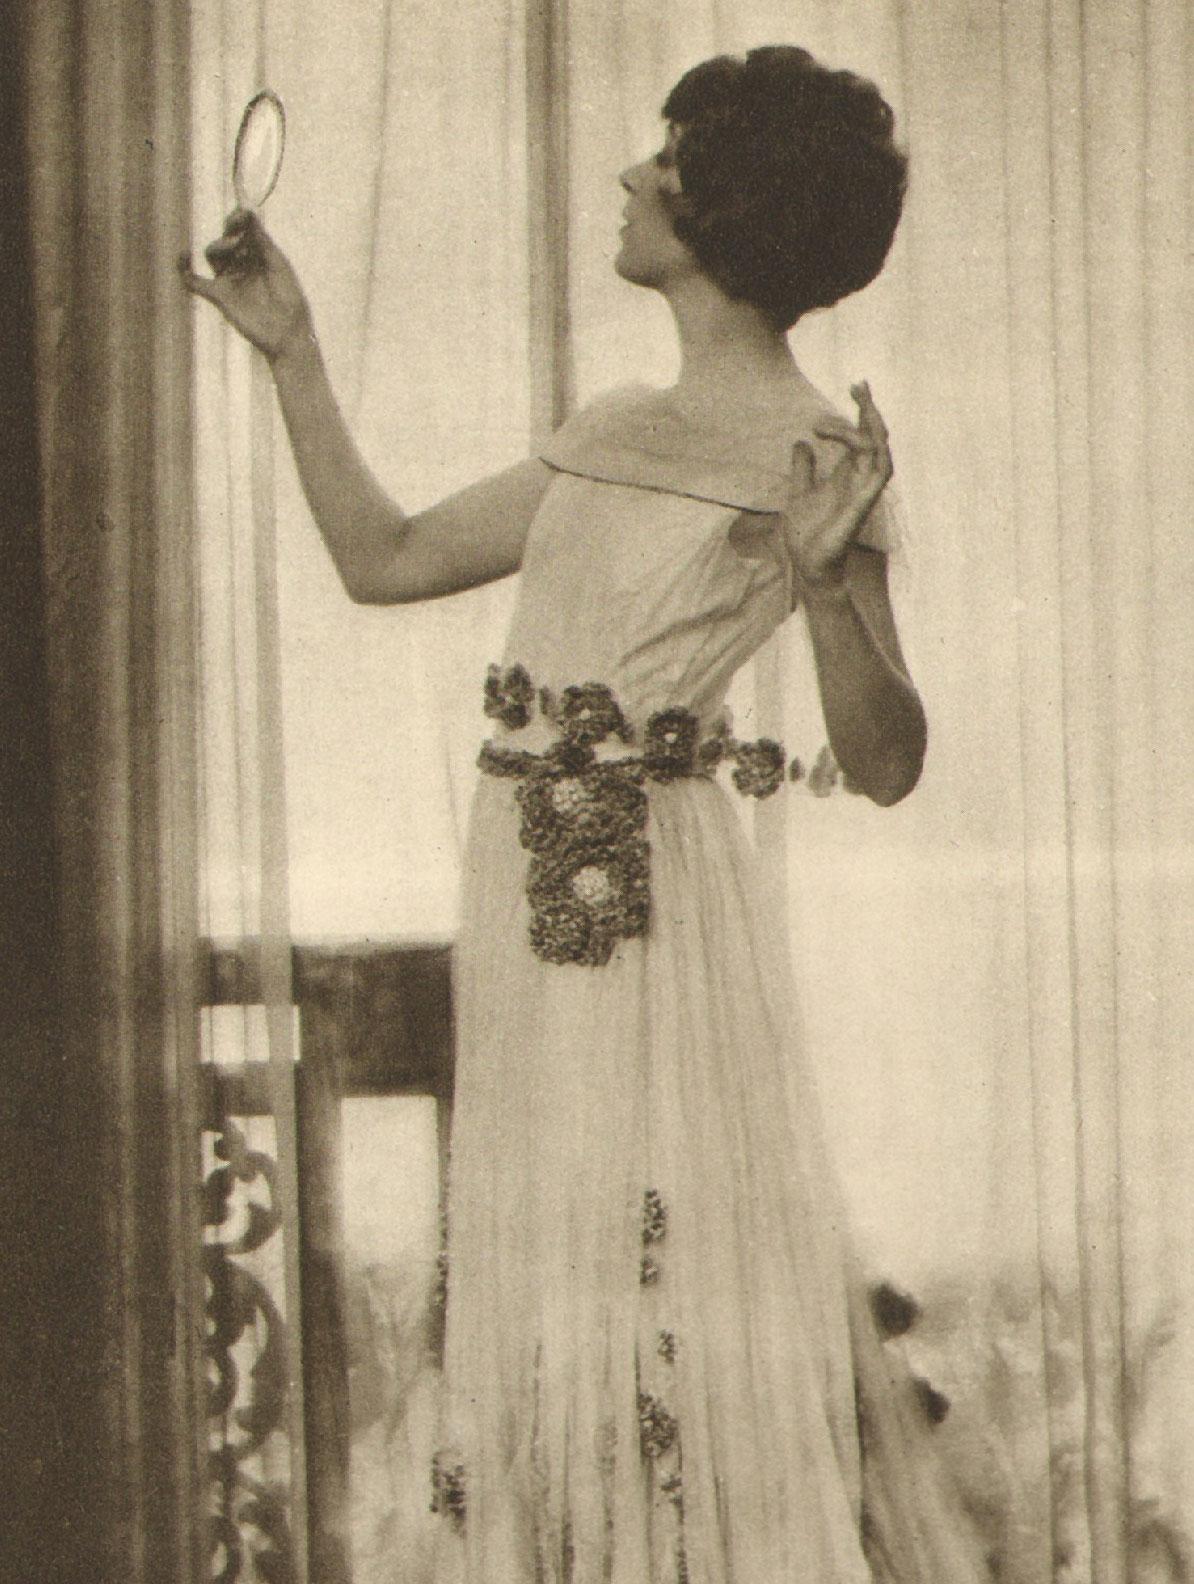 Ina Claire, 1921